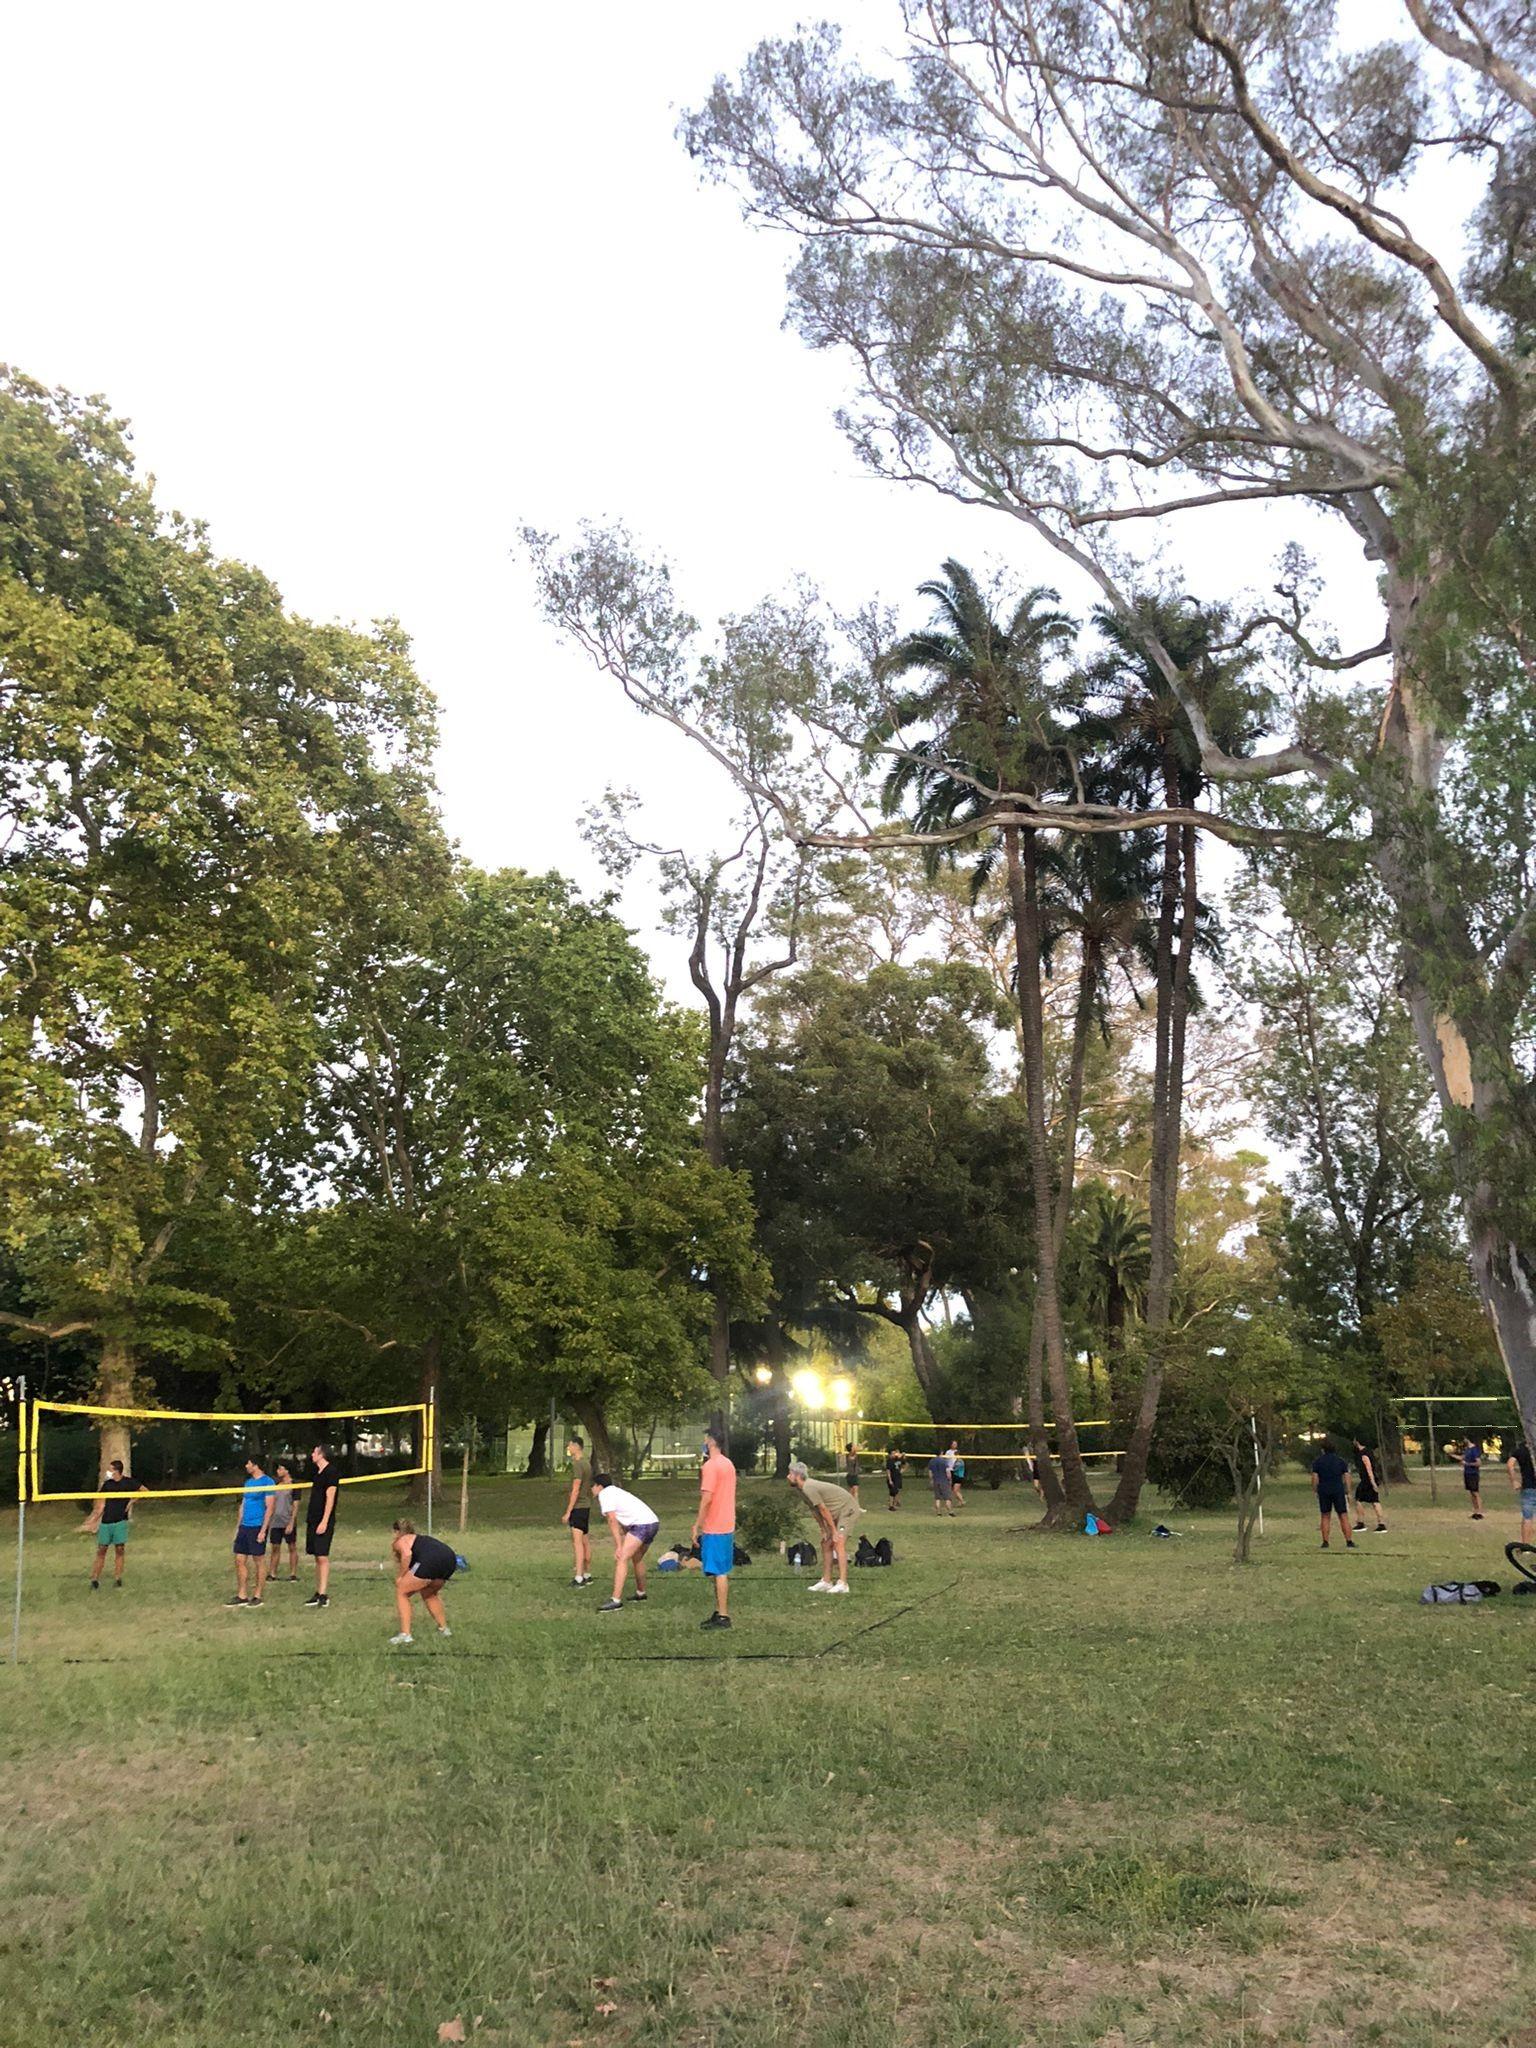 Volley and beer at Campo grande garden